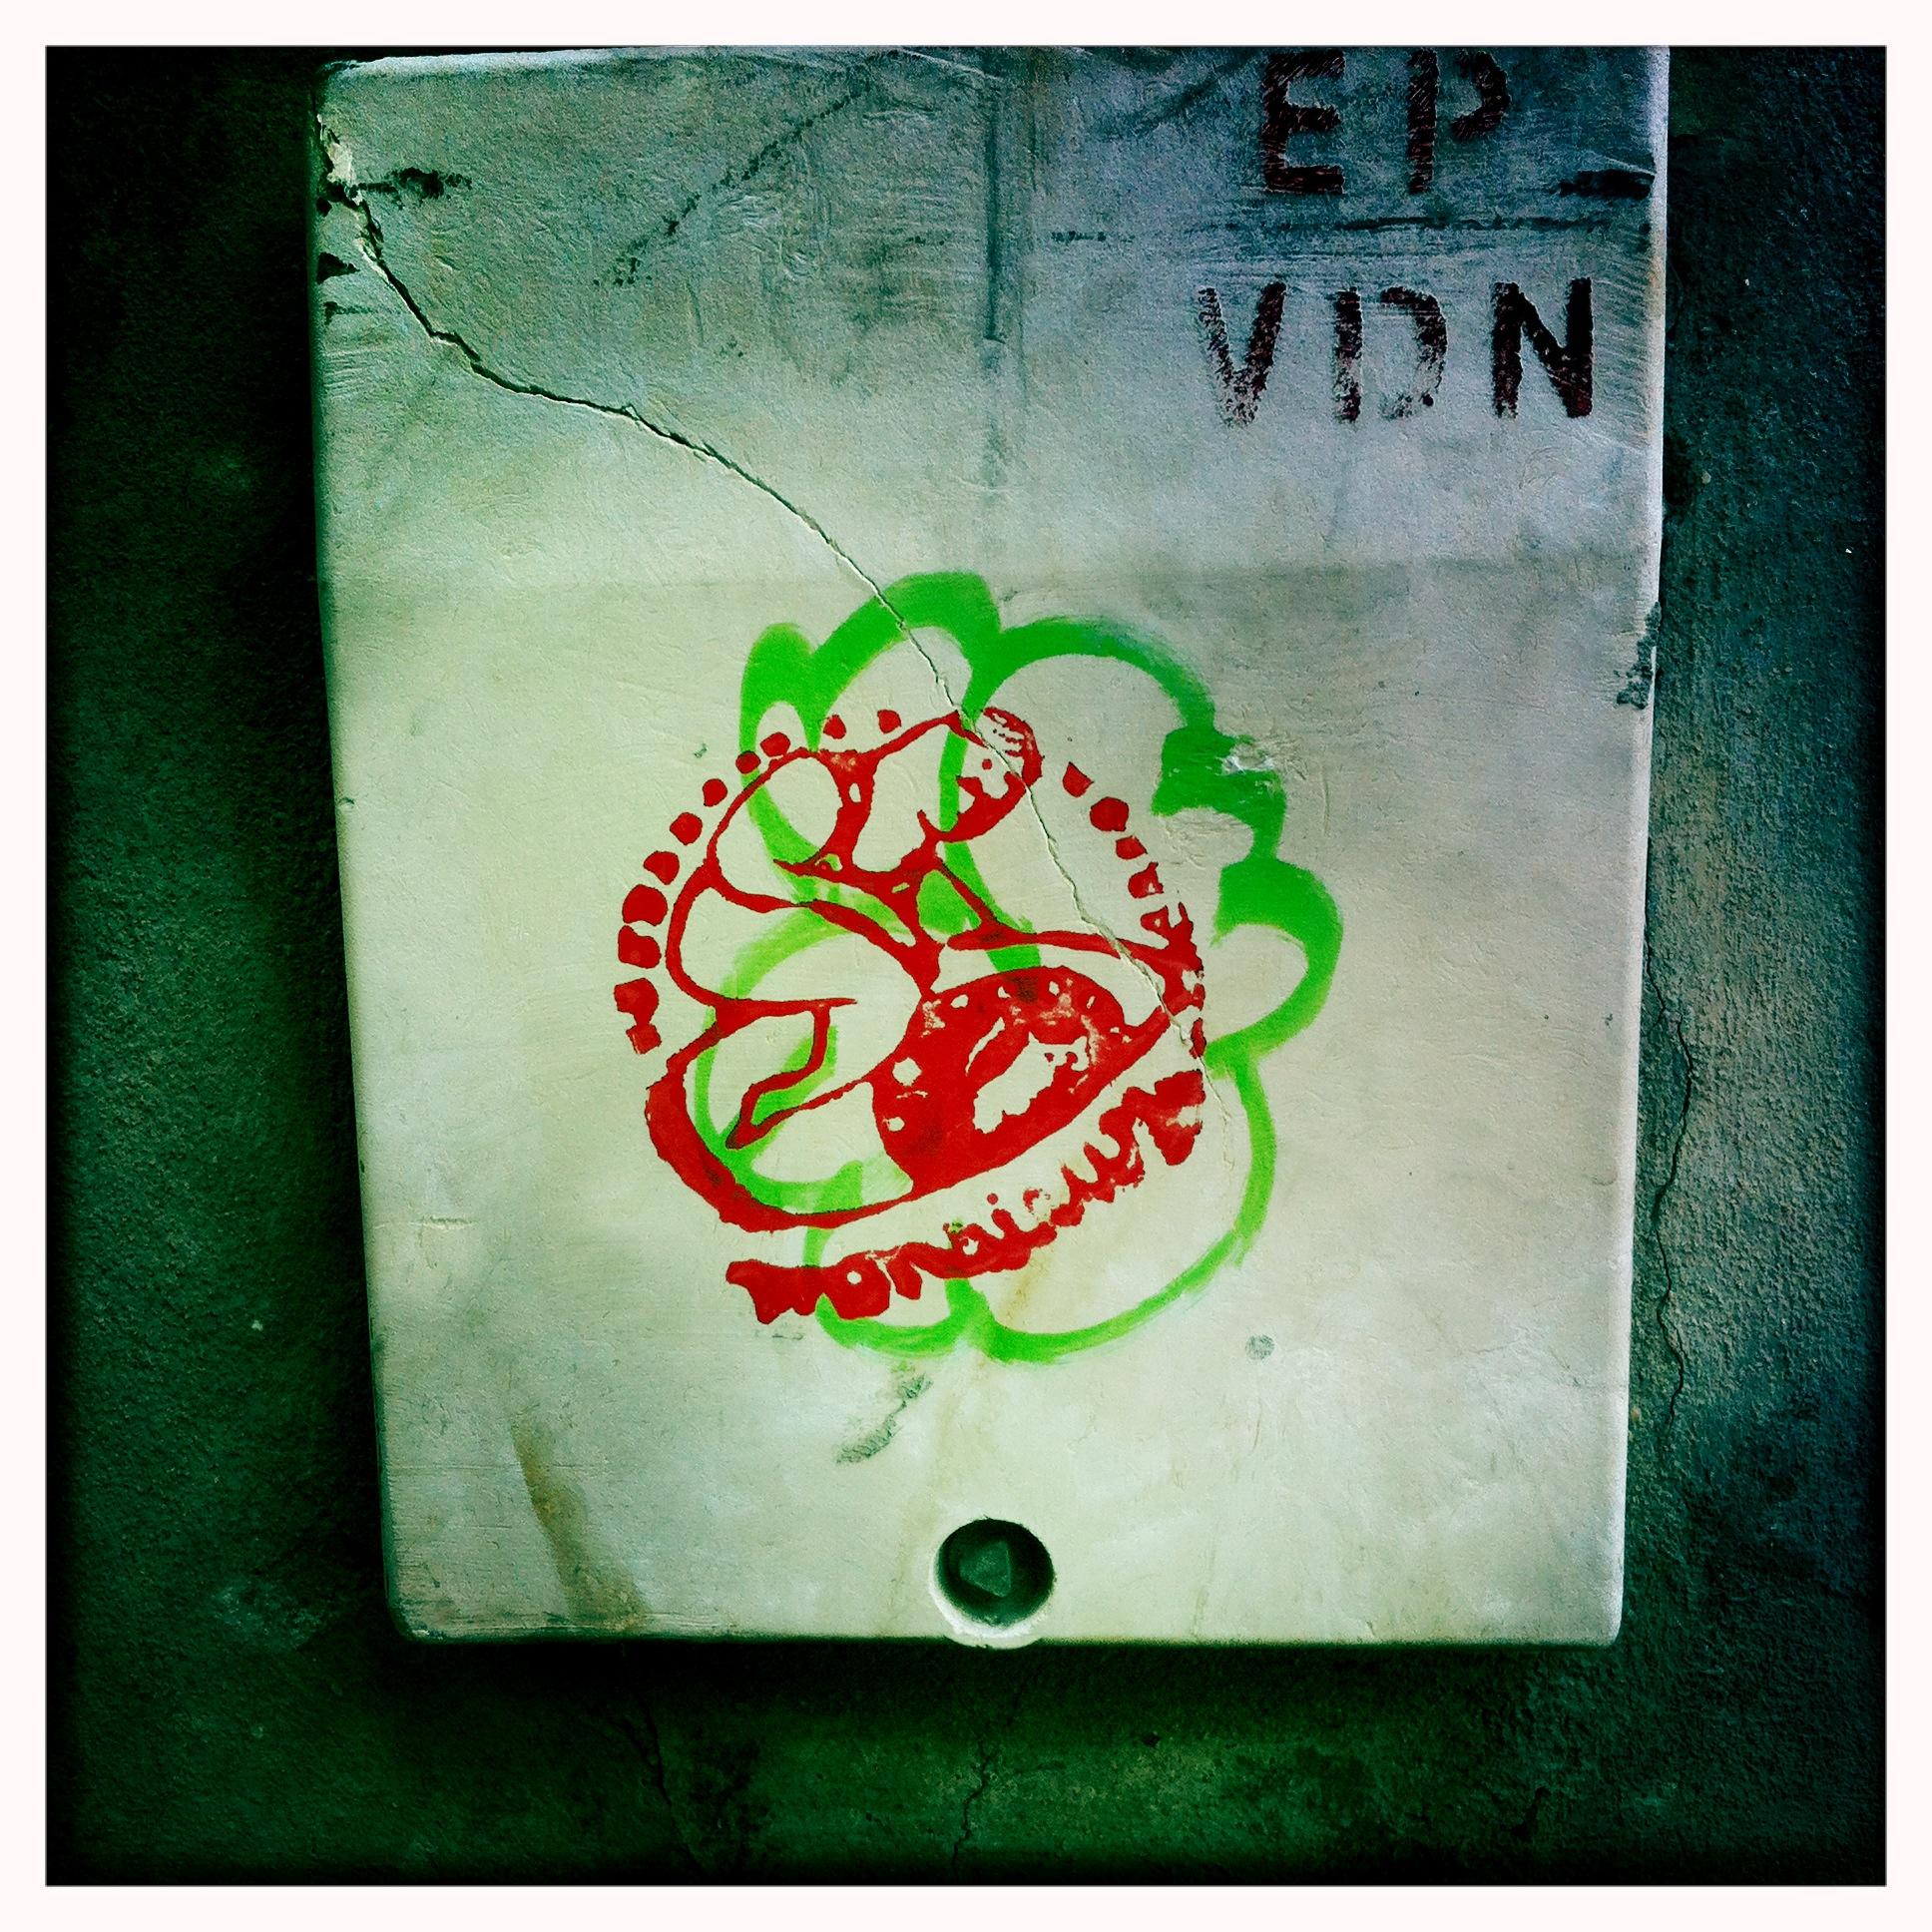 02 – monsieur – du 20 mars au 10 avril 2012